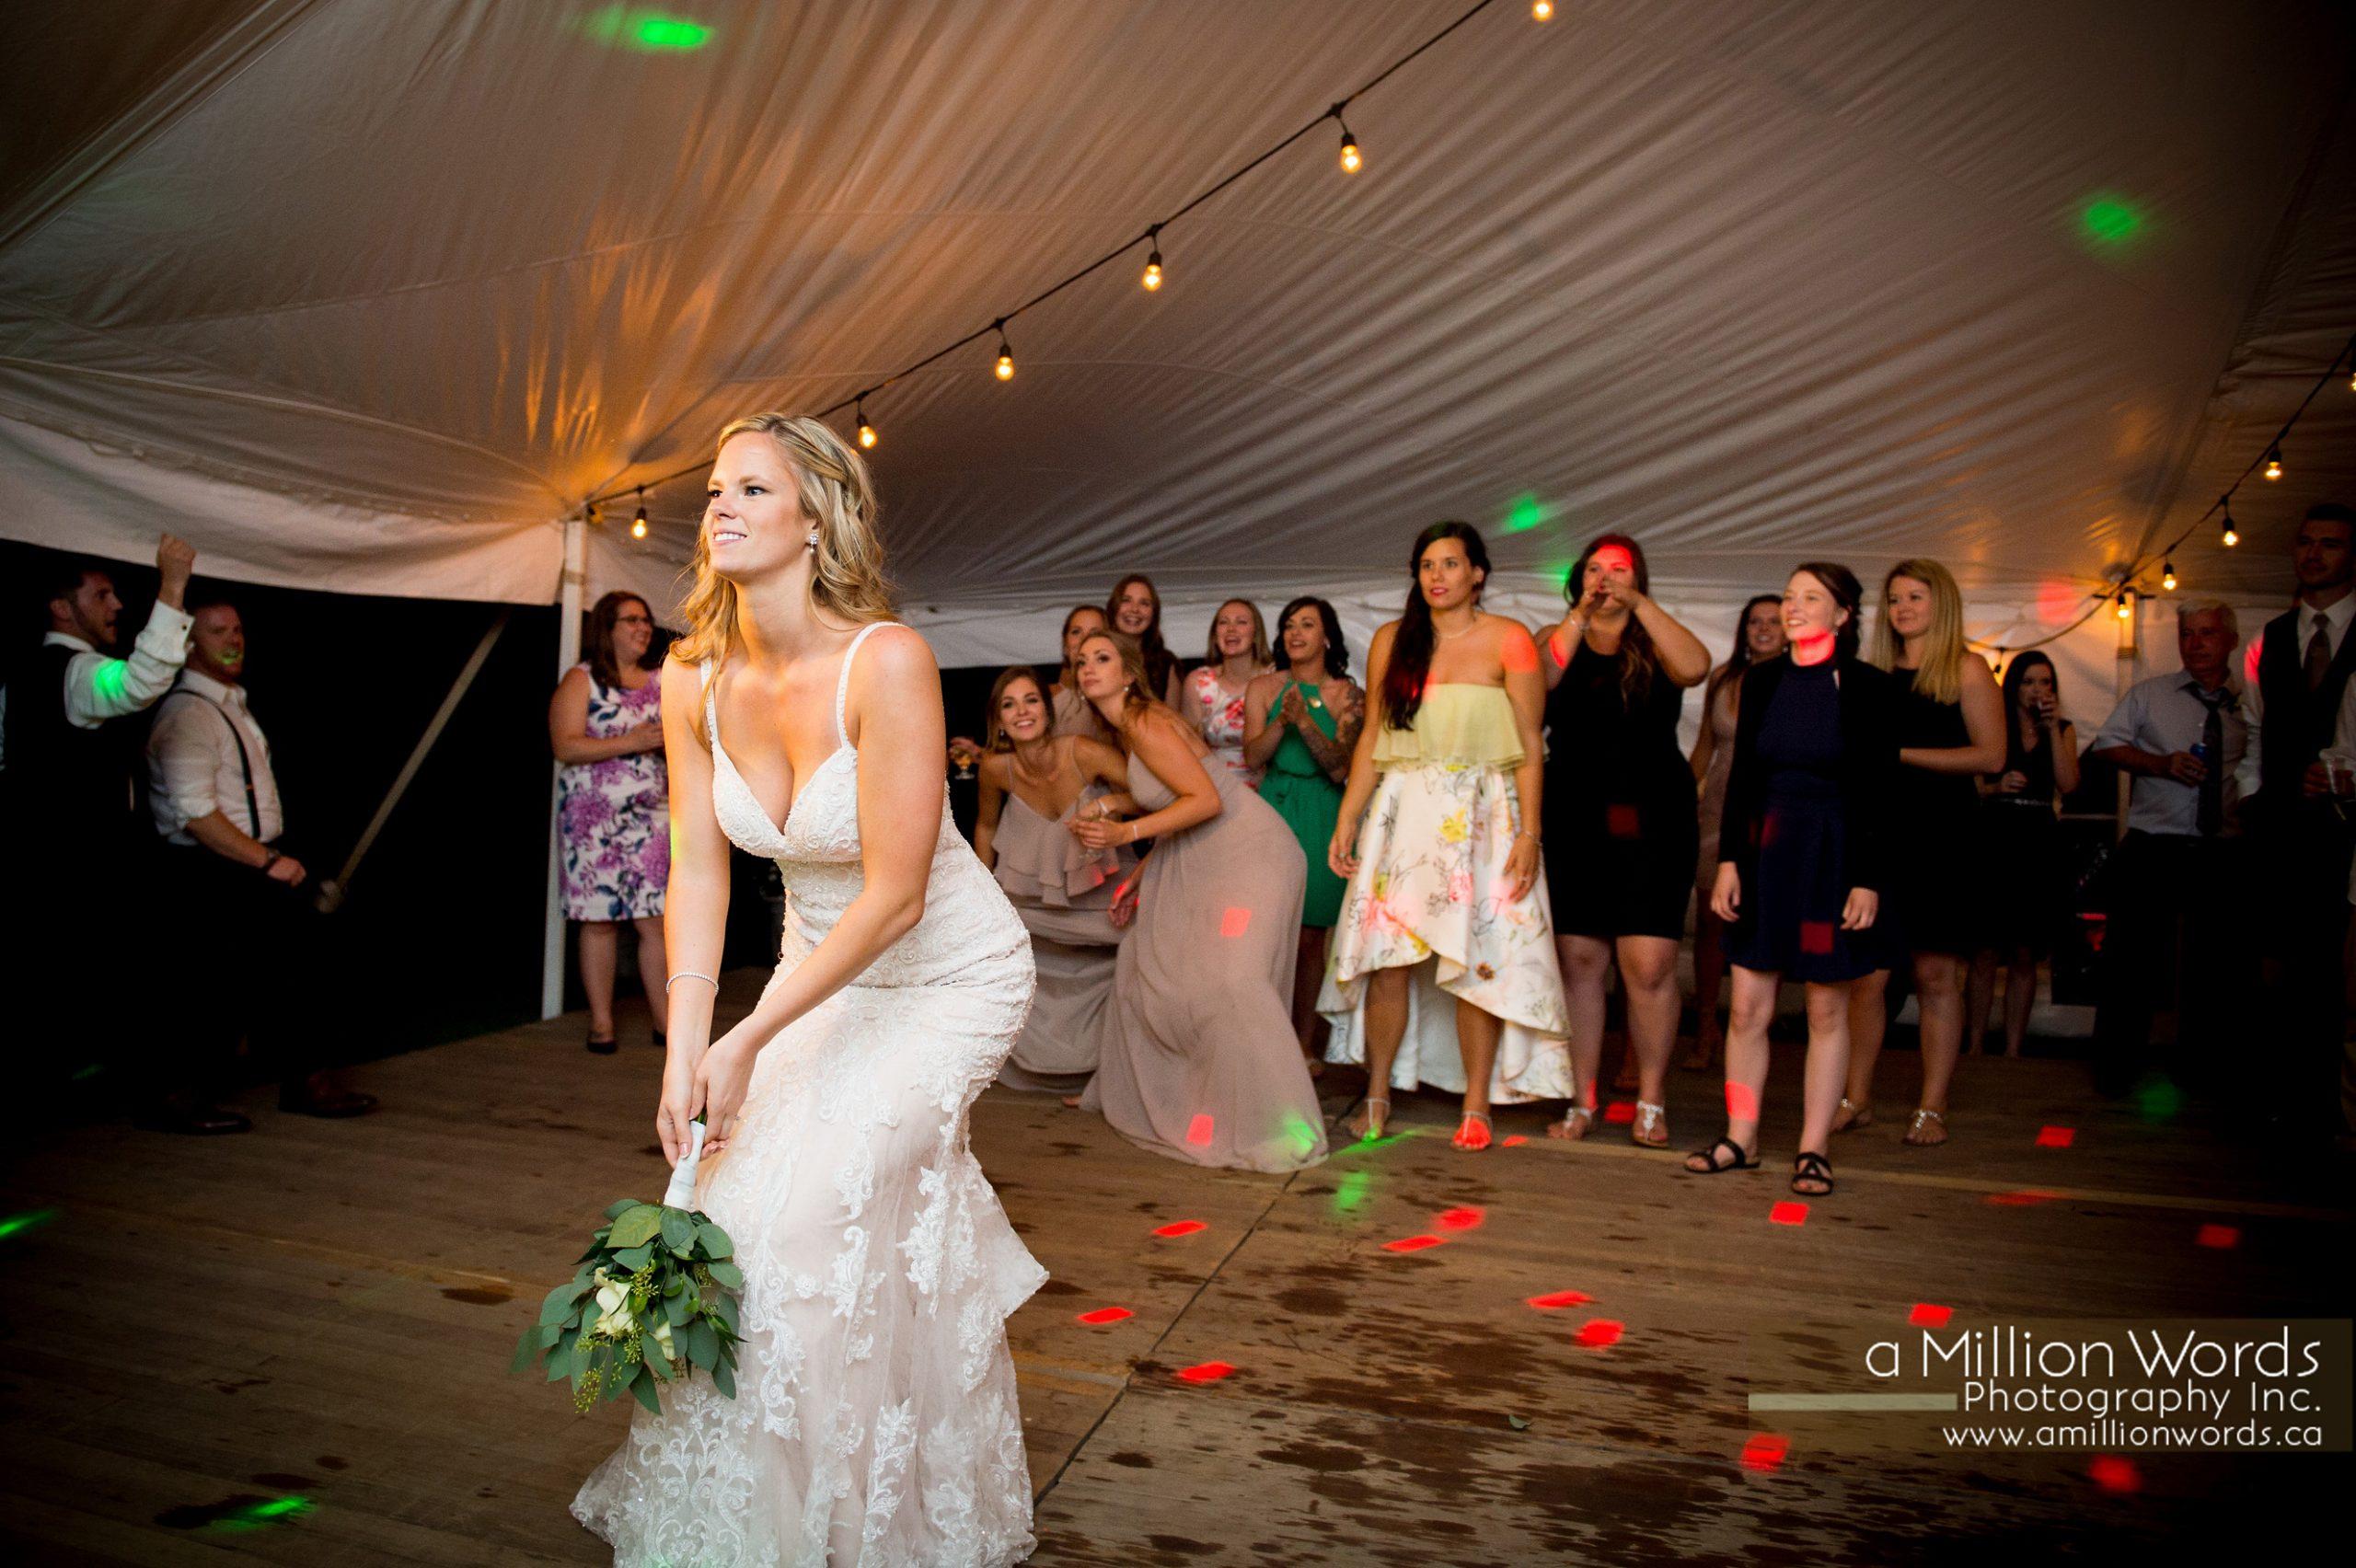 arthur_wedding_photographer82